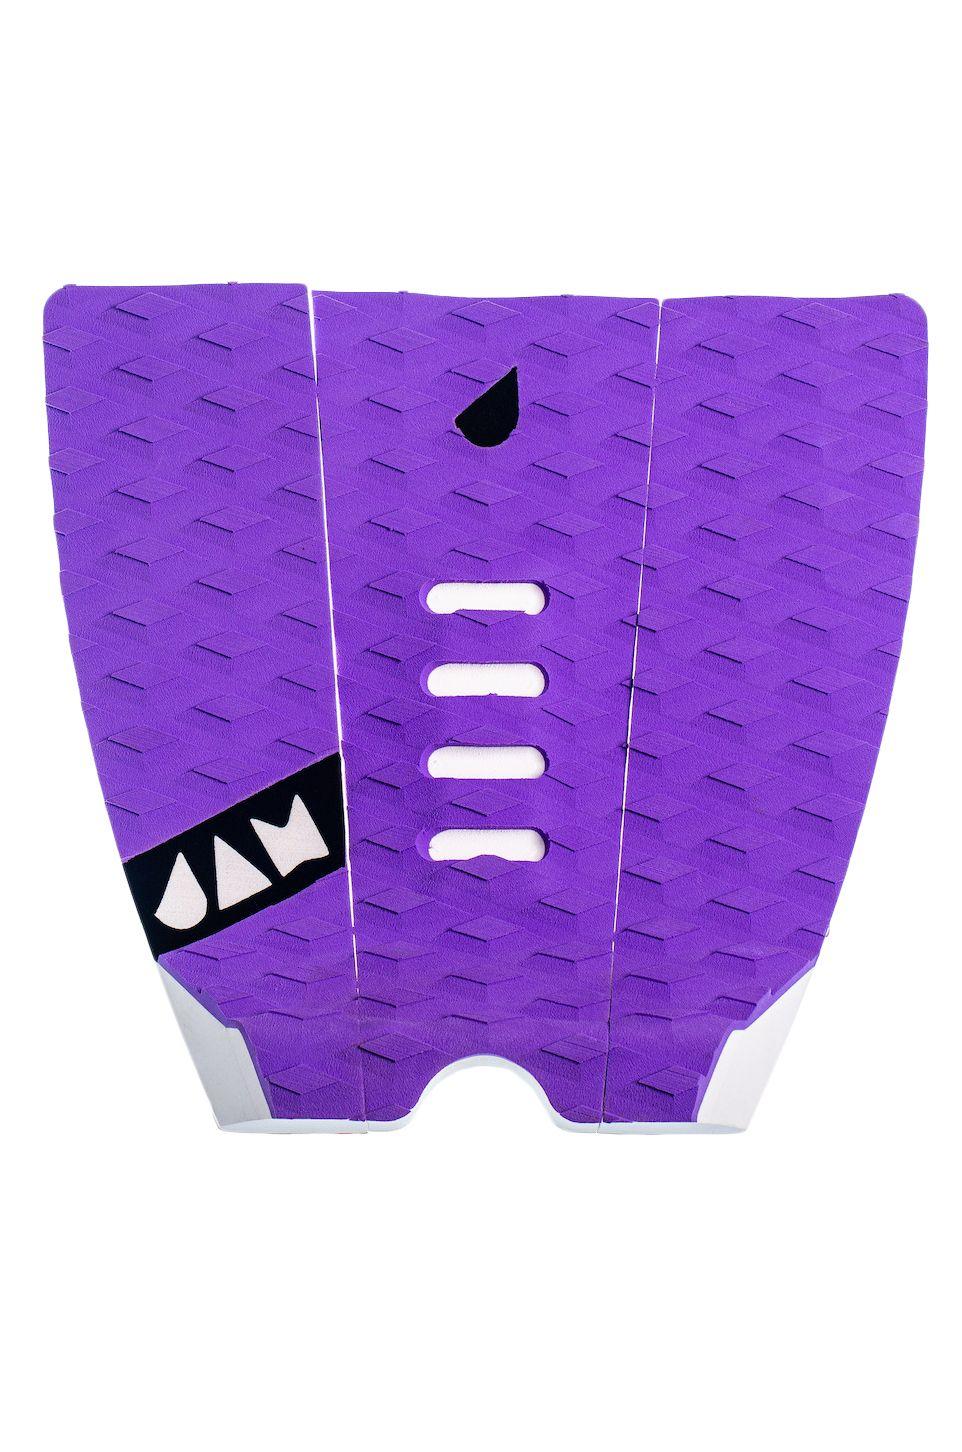 Jam Deck MINI-ME SMALL 3 PIECE TRACTION PAD Purple/White